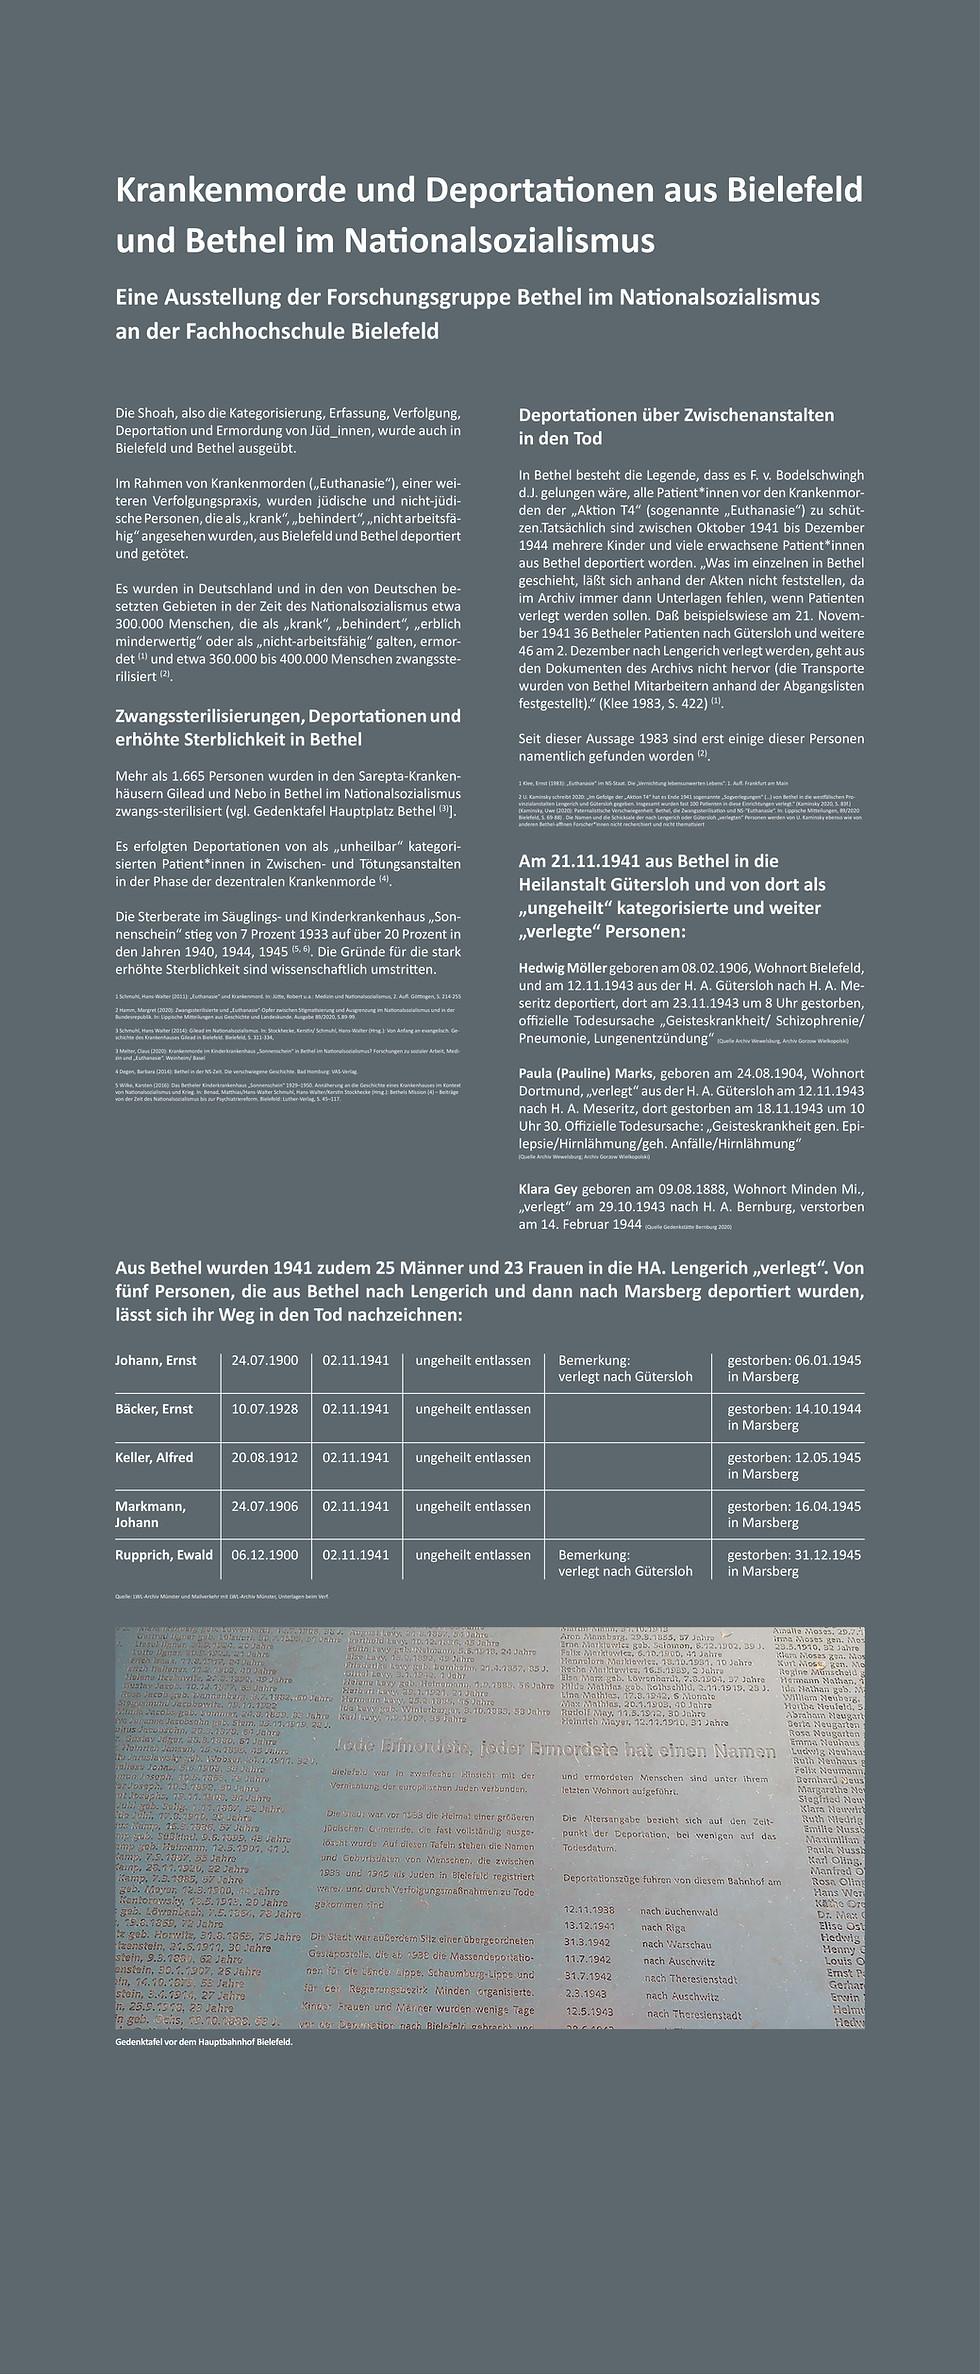 Krankenmorde und Deportationen-001.jpg